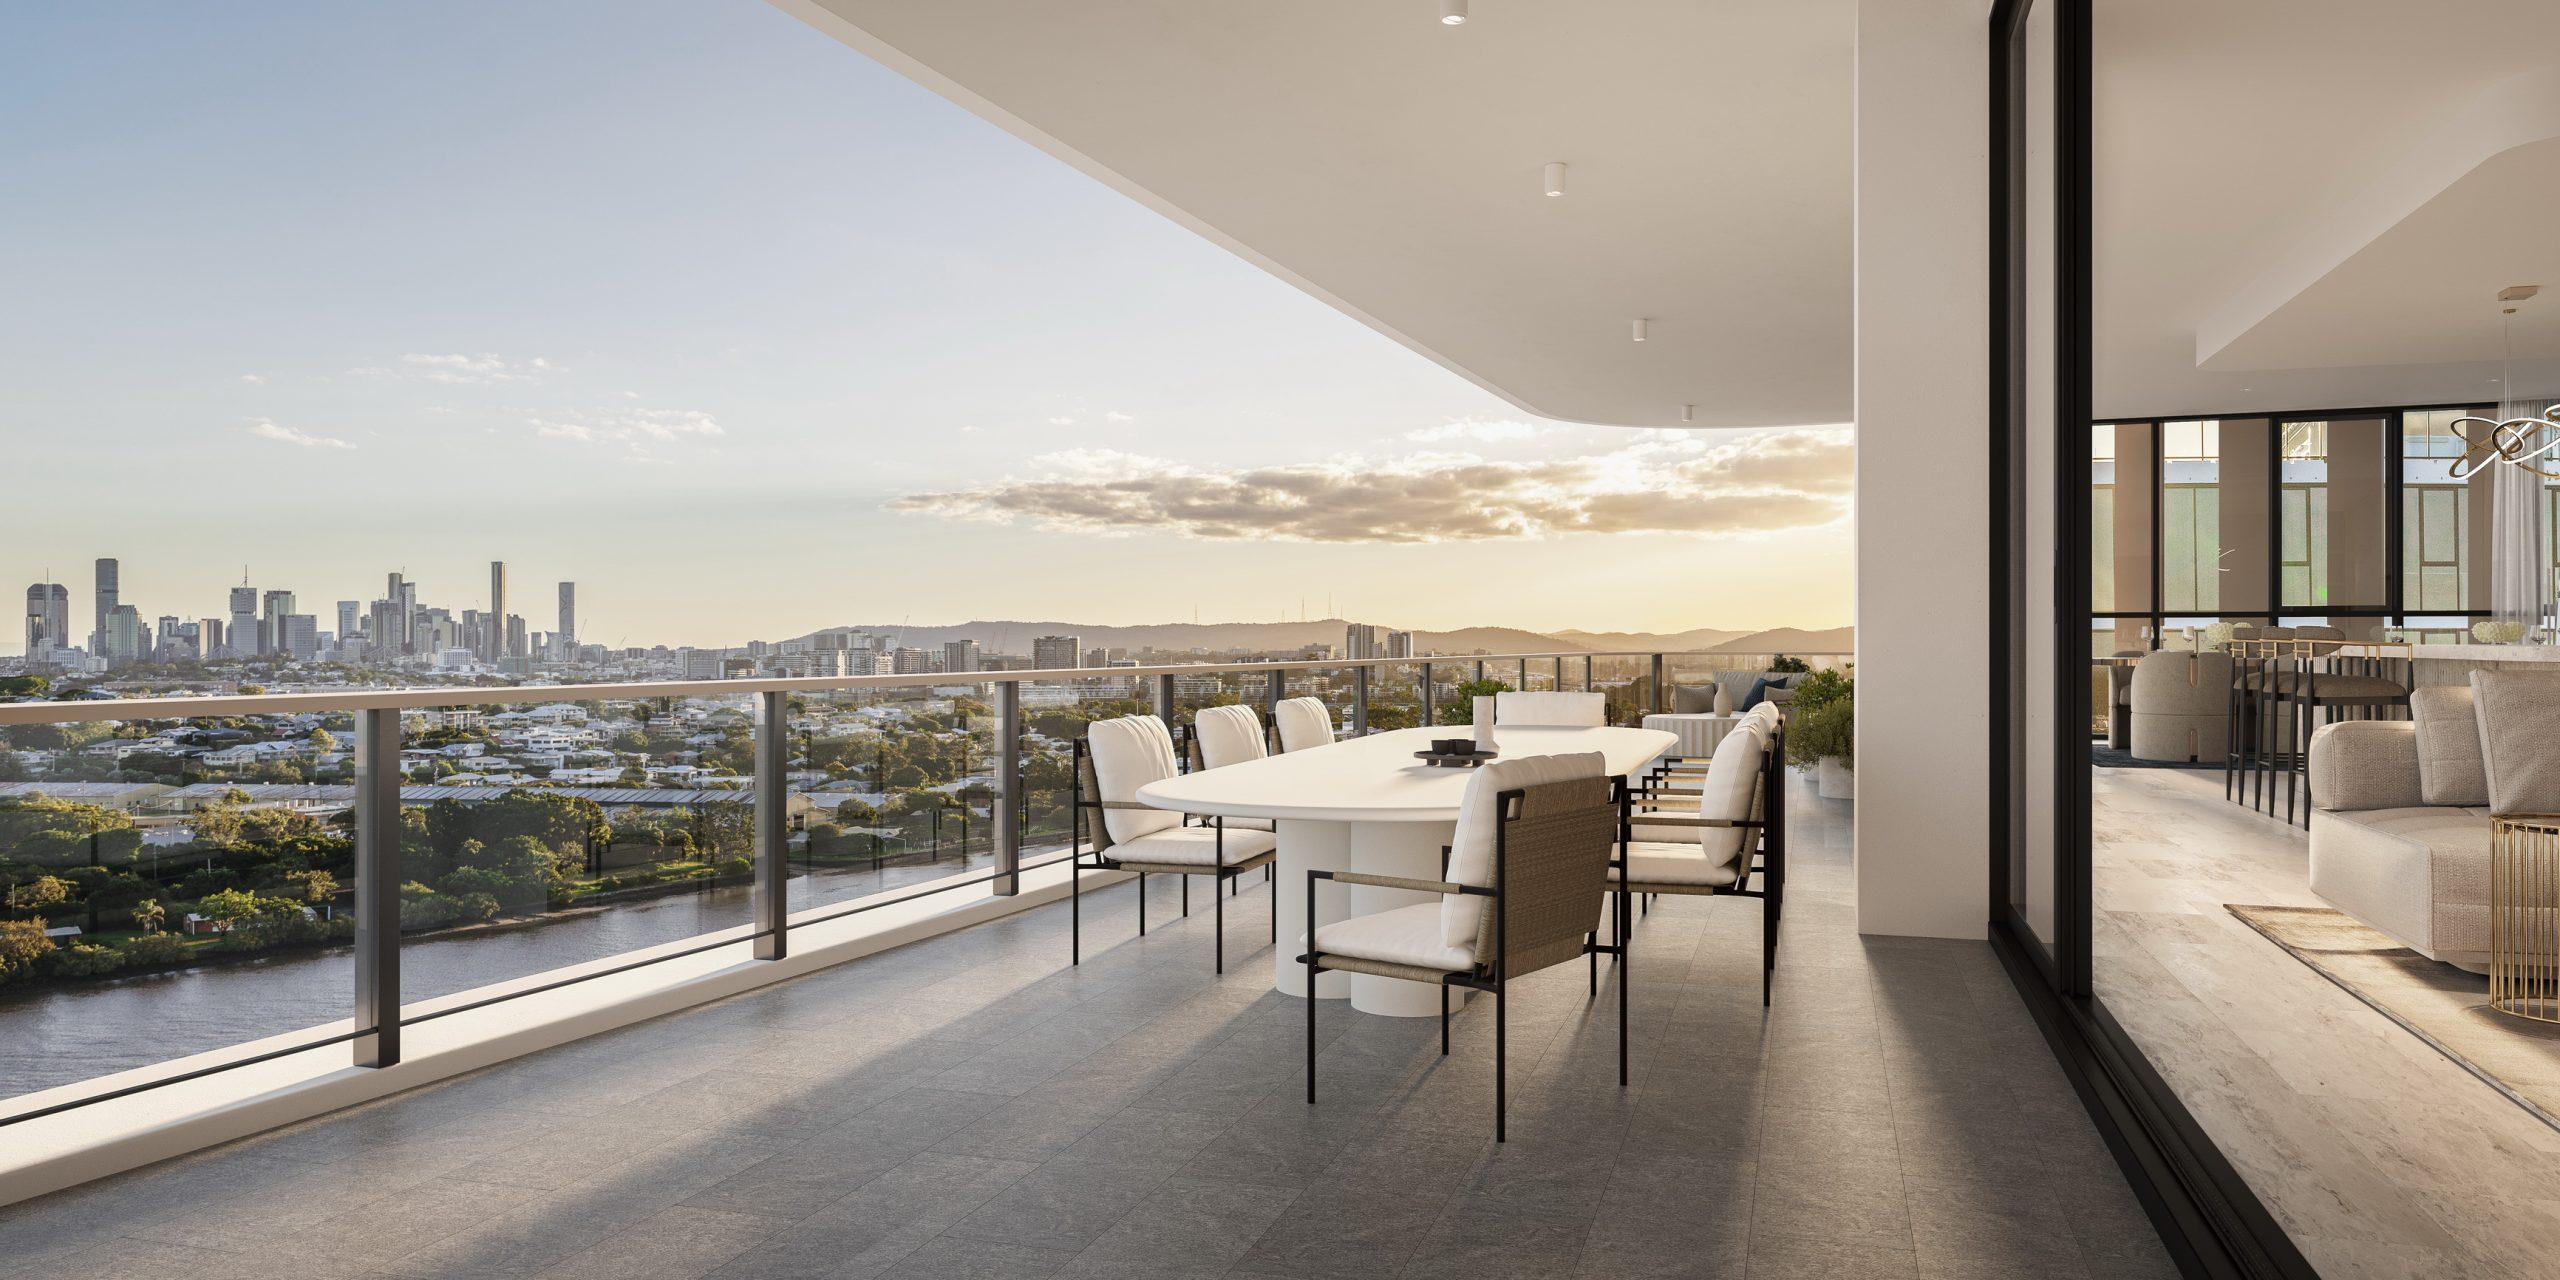 render-fkd-studio-penthouse-rivello-design-3d-balcony